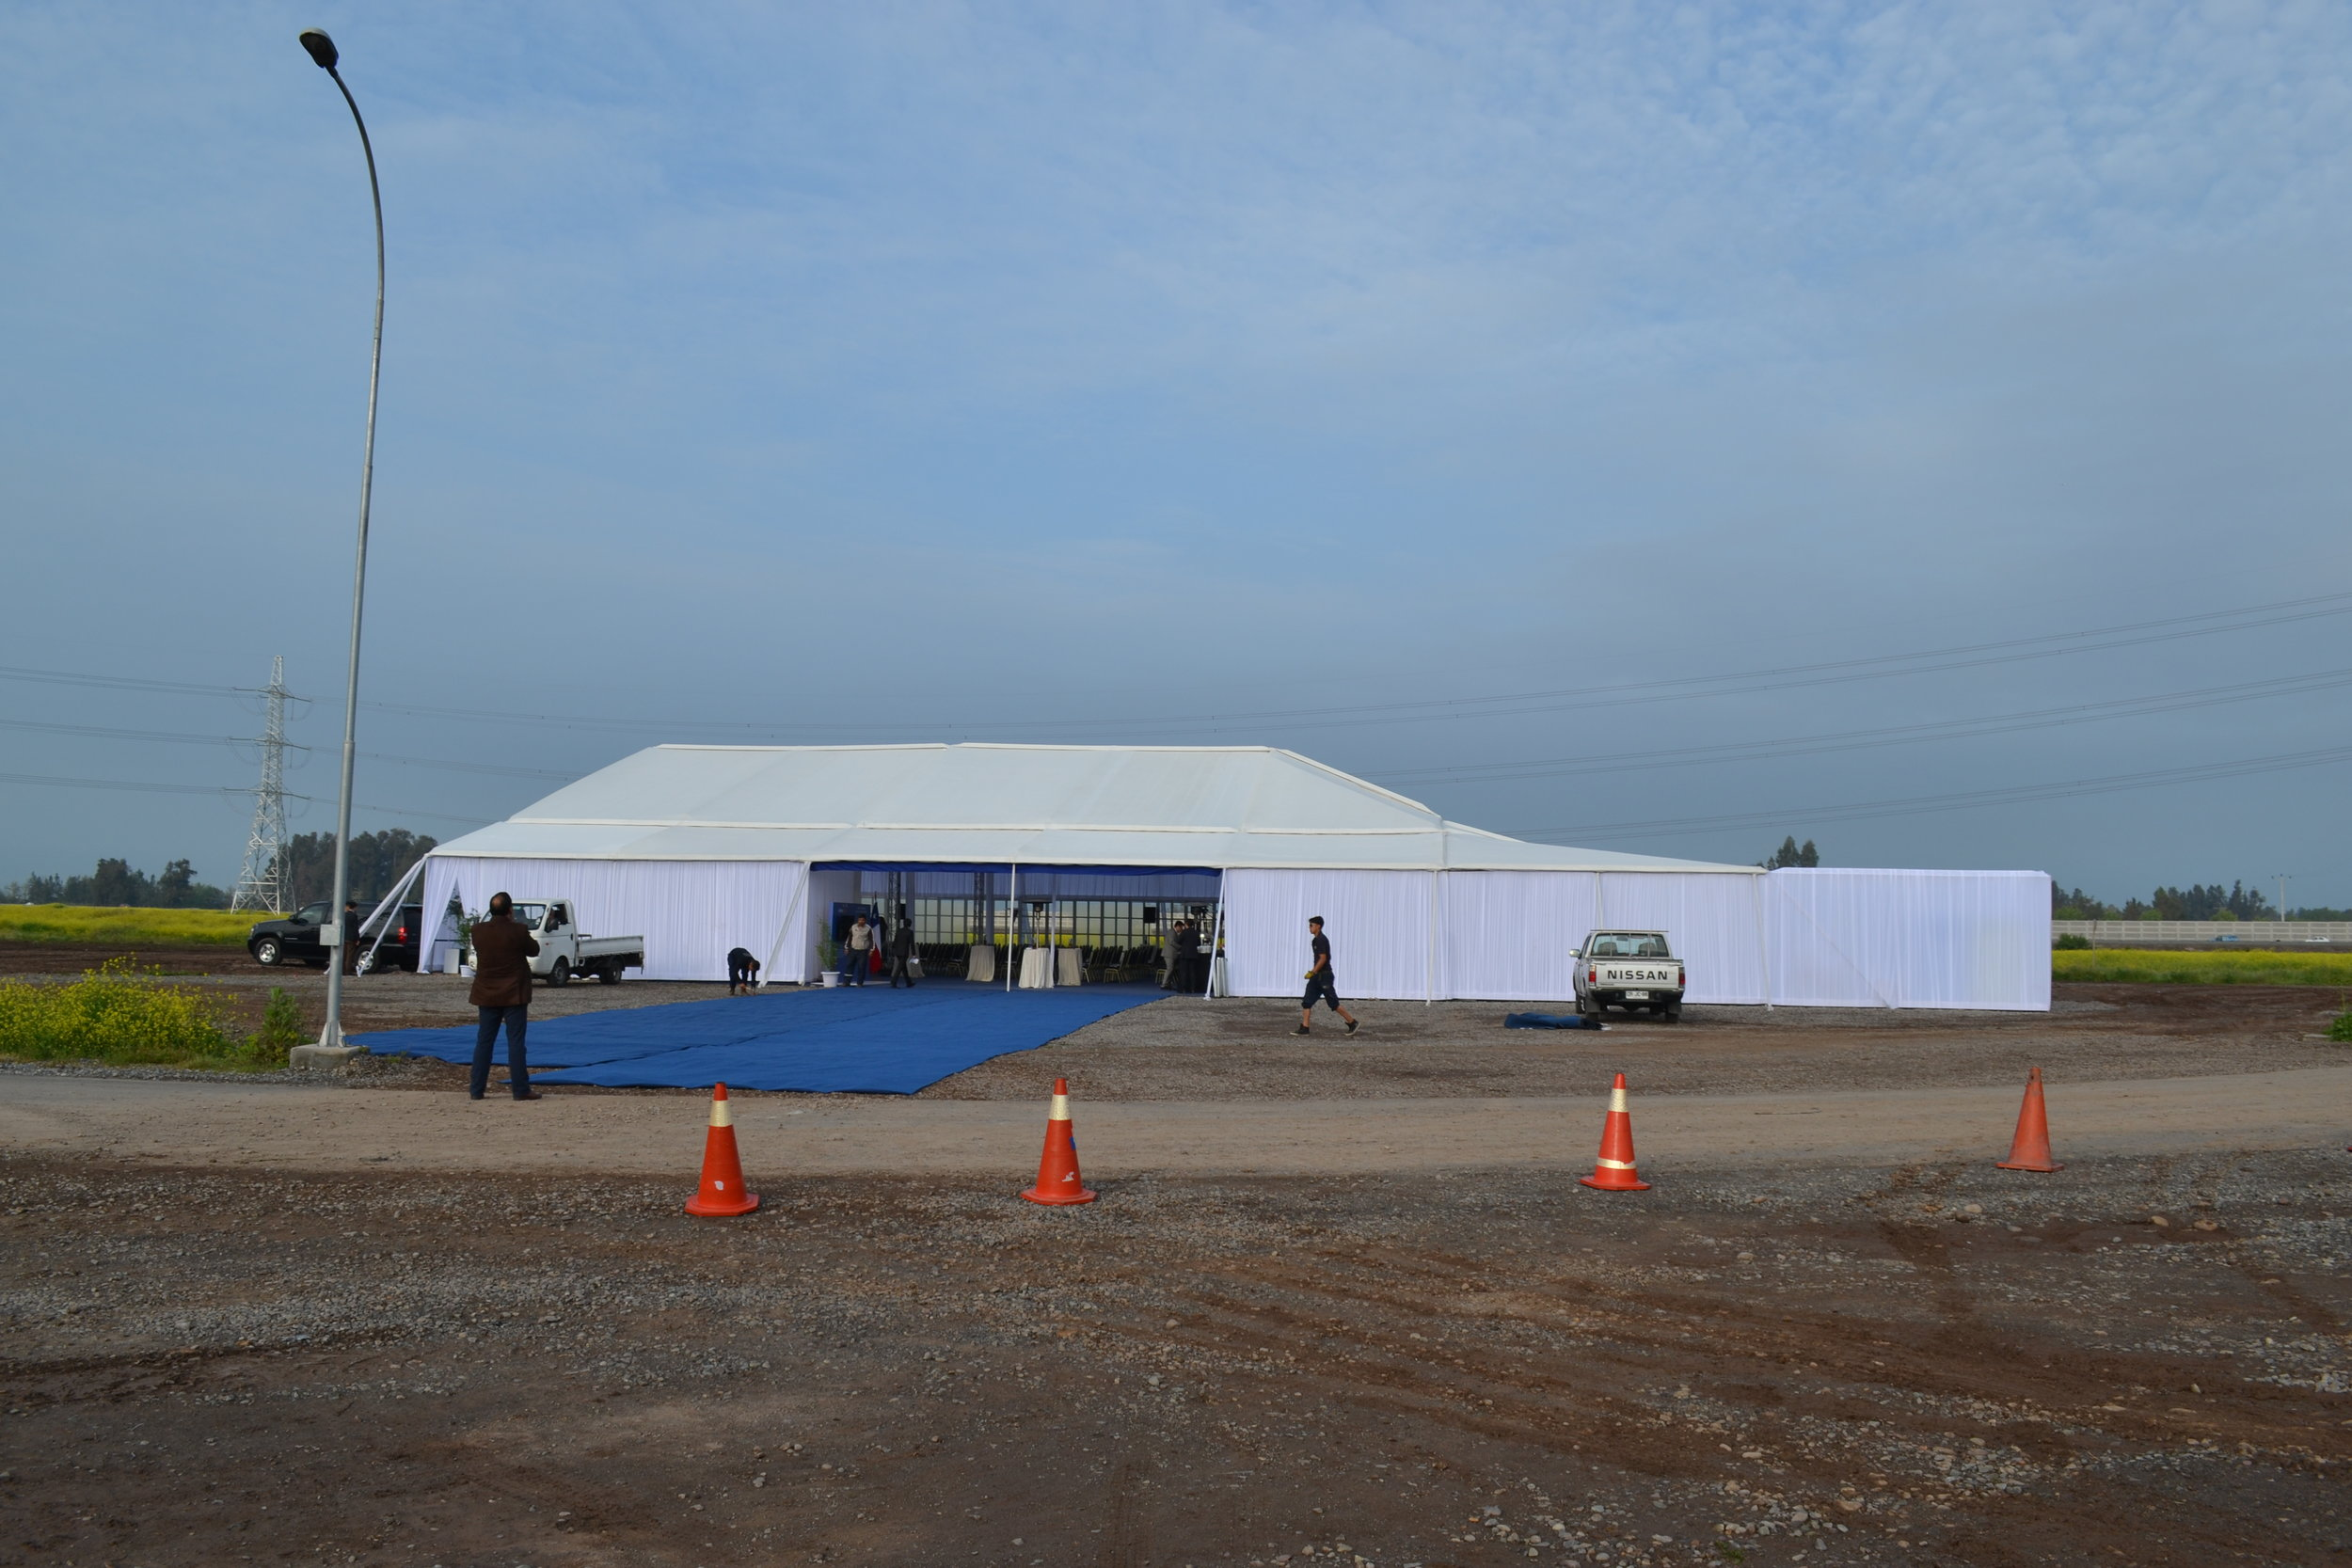 produccion-evento-inauguracion-subestacion-buin-celeoredes-chile-cproducciones-6